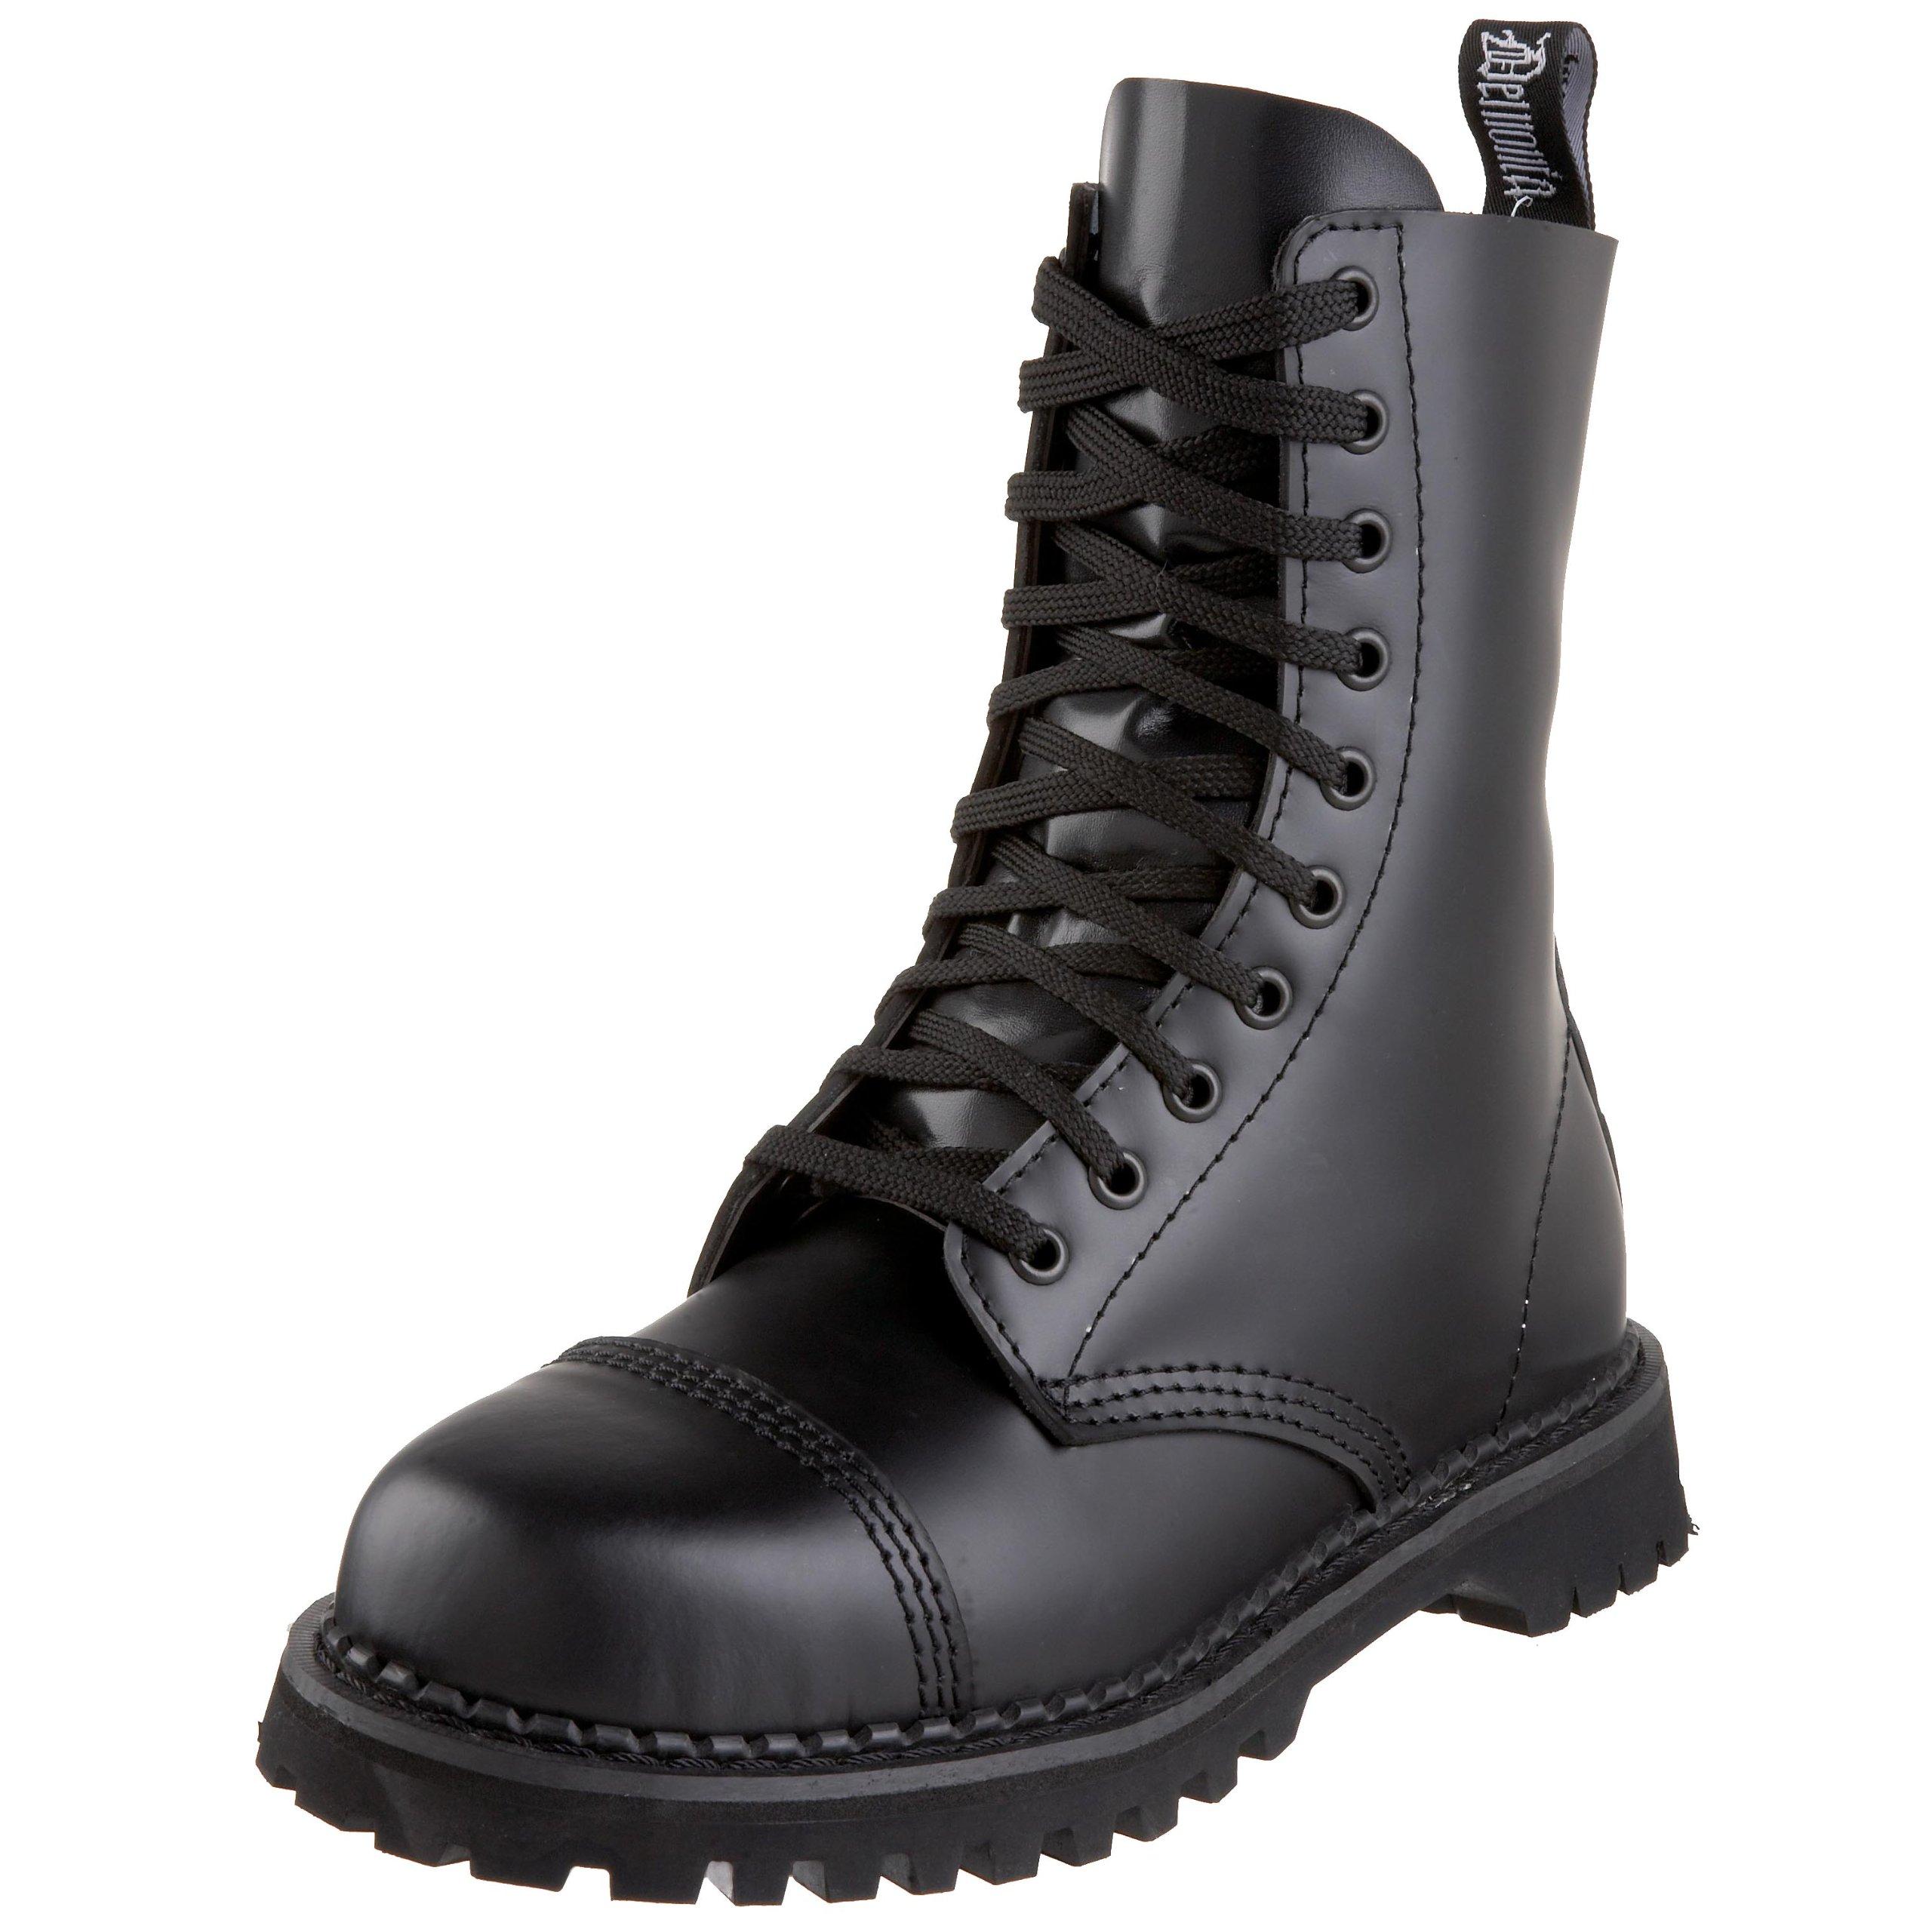 Pleaser Men's Rocky 10 Boot,Black Leather,9 M US